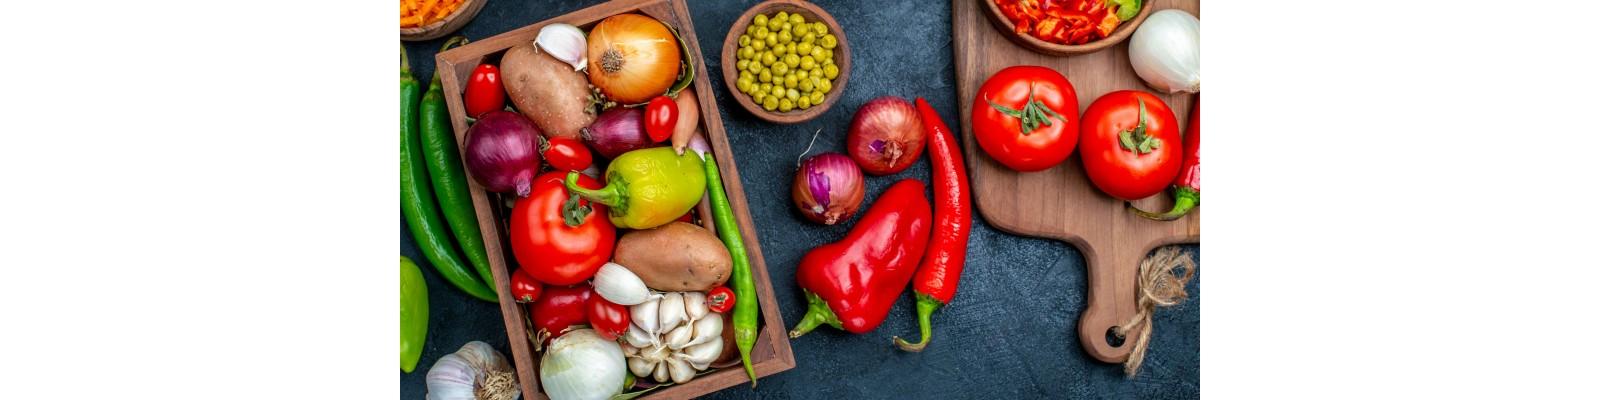 Legumele, fructele si vitamina C